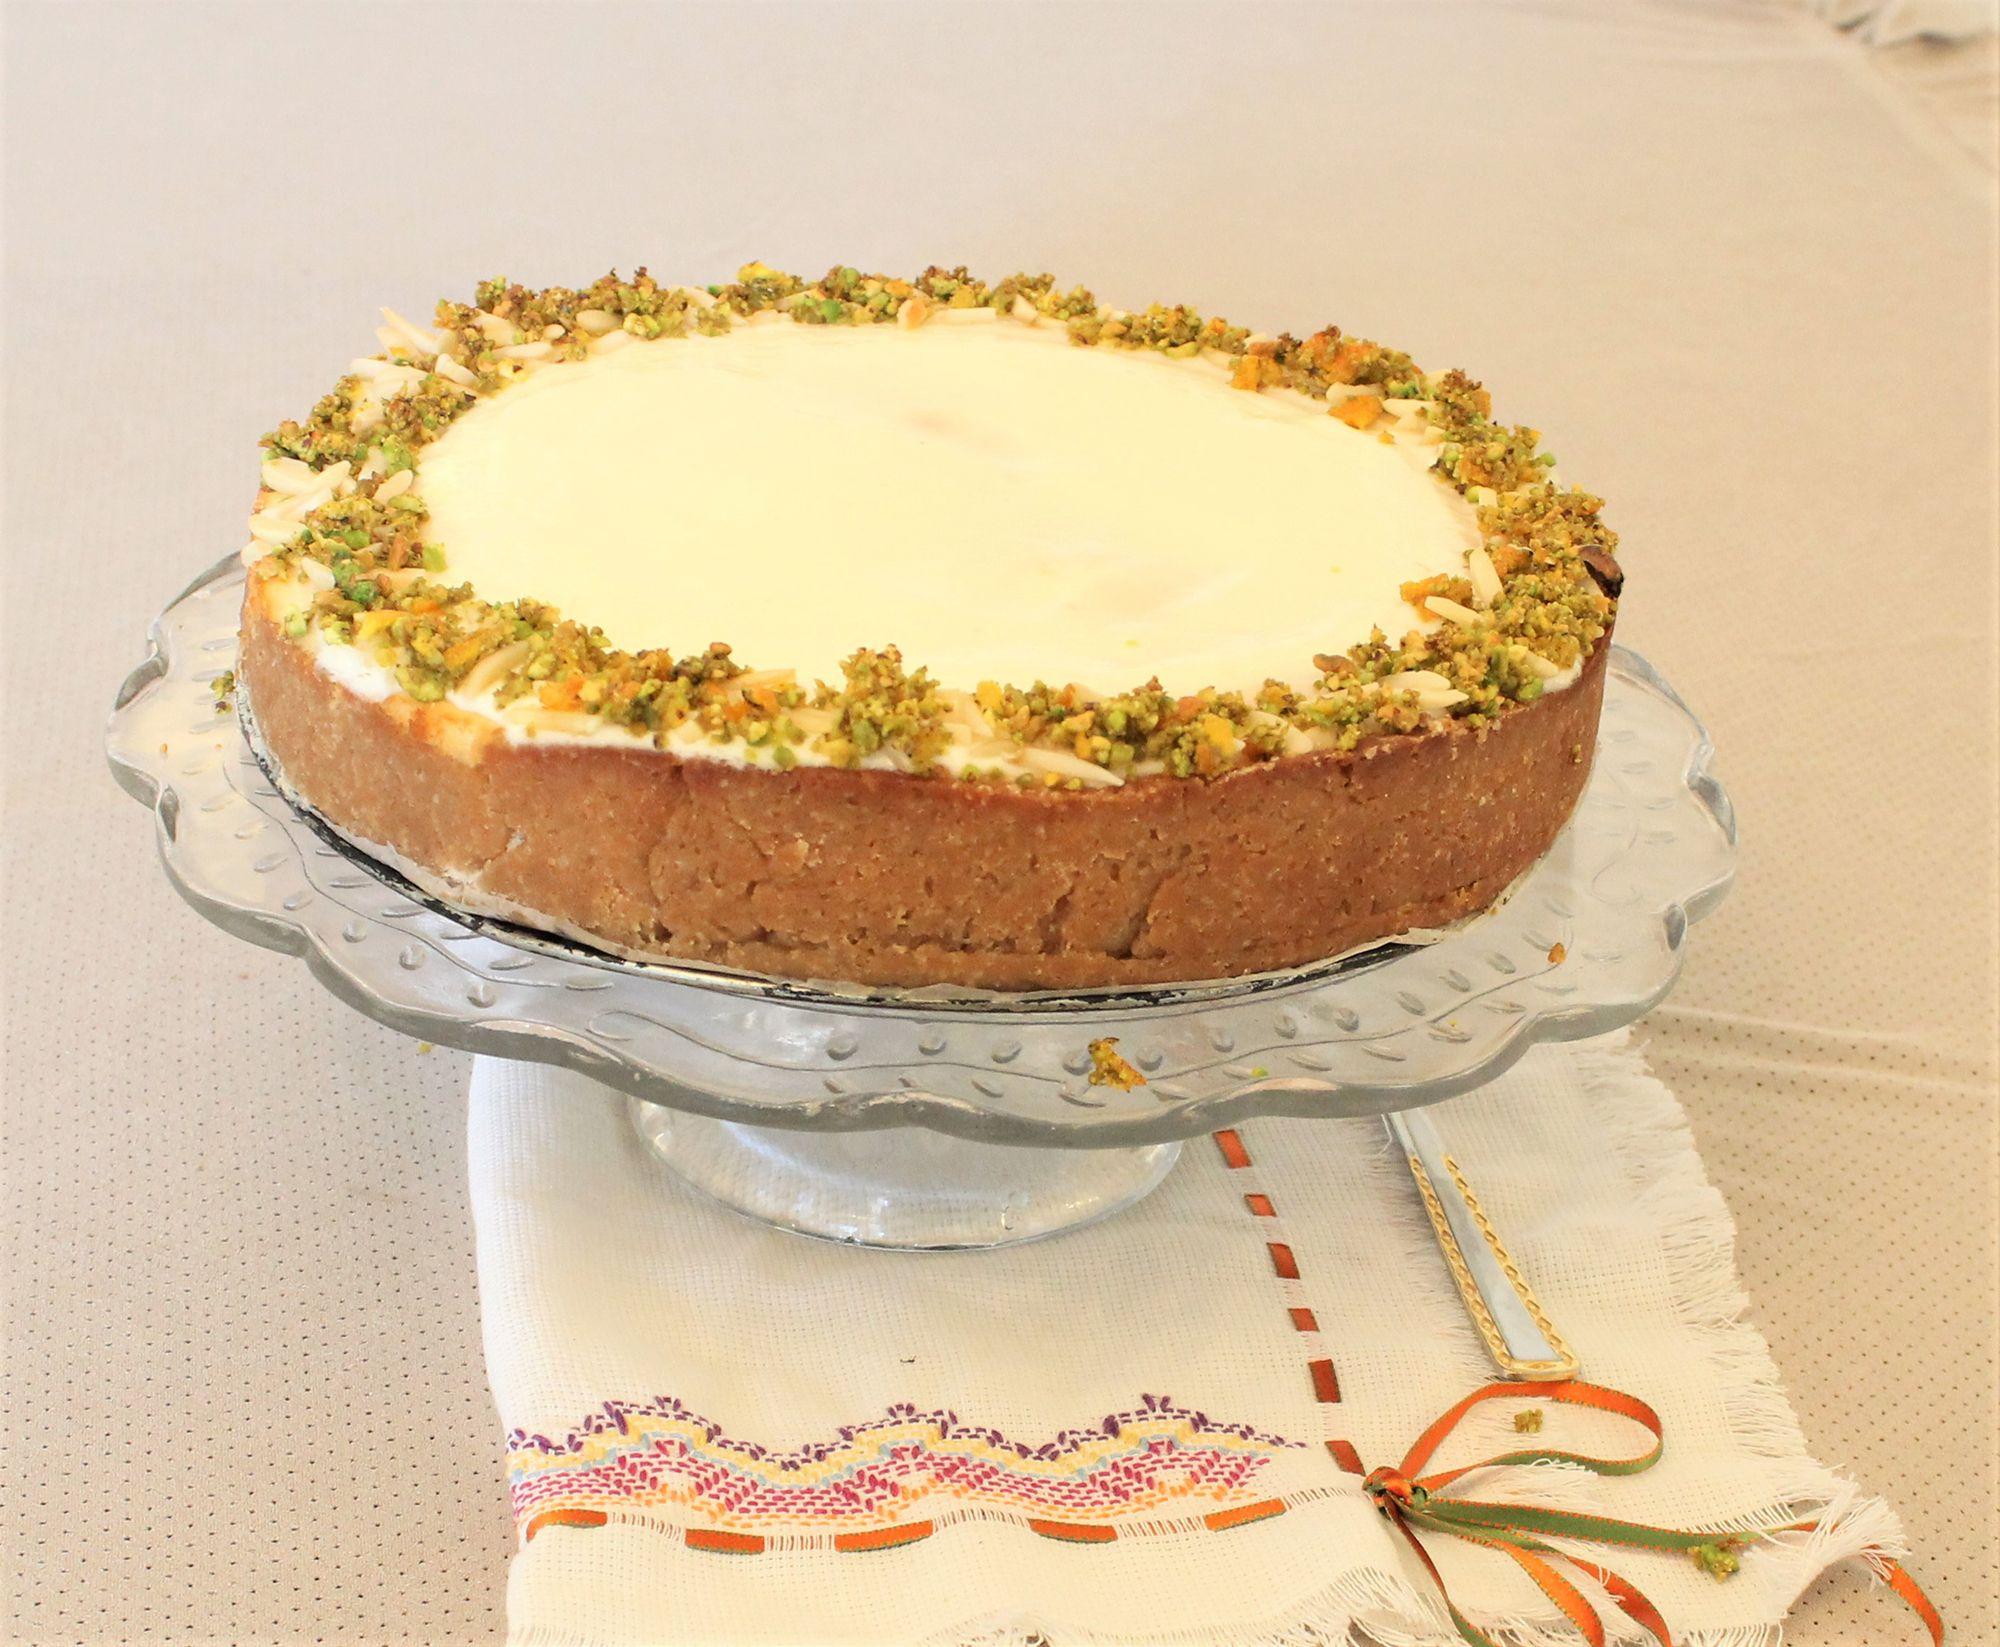 IMG 3774 - עוגת גבינה בניחוח פרות הדר